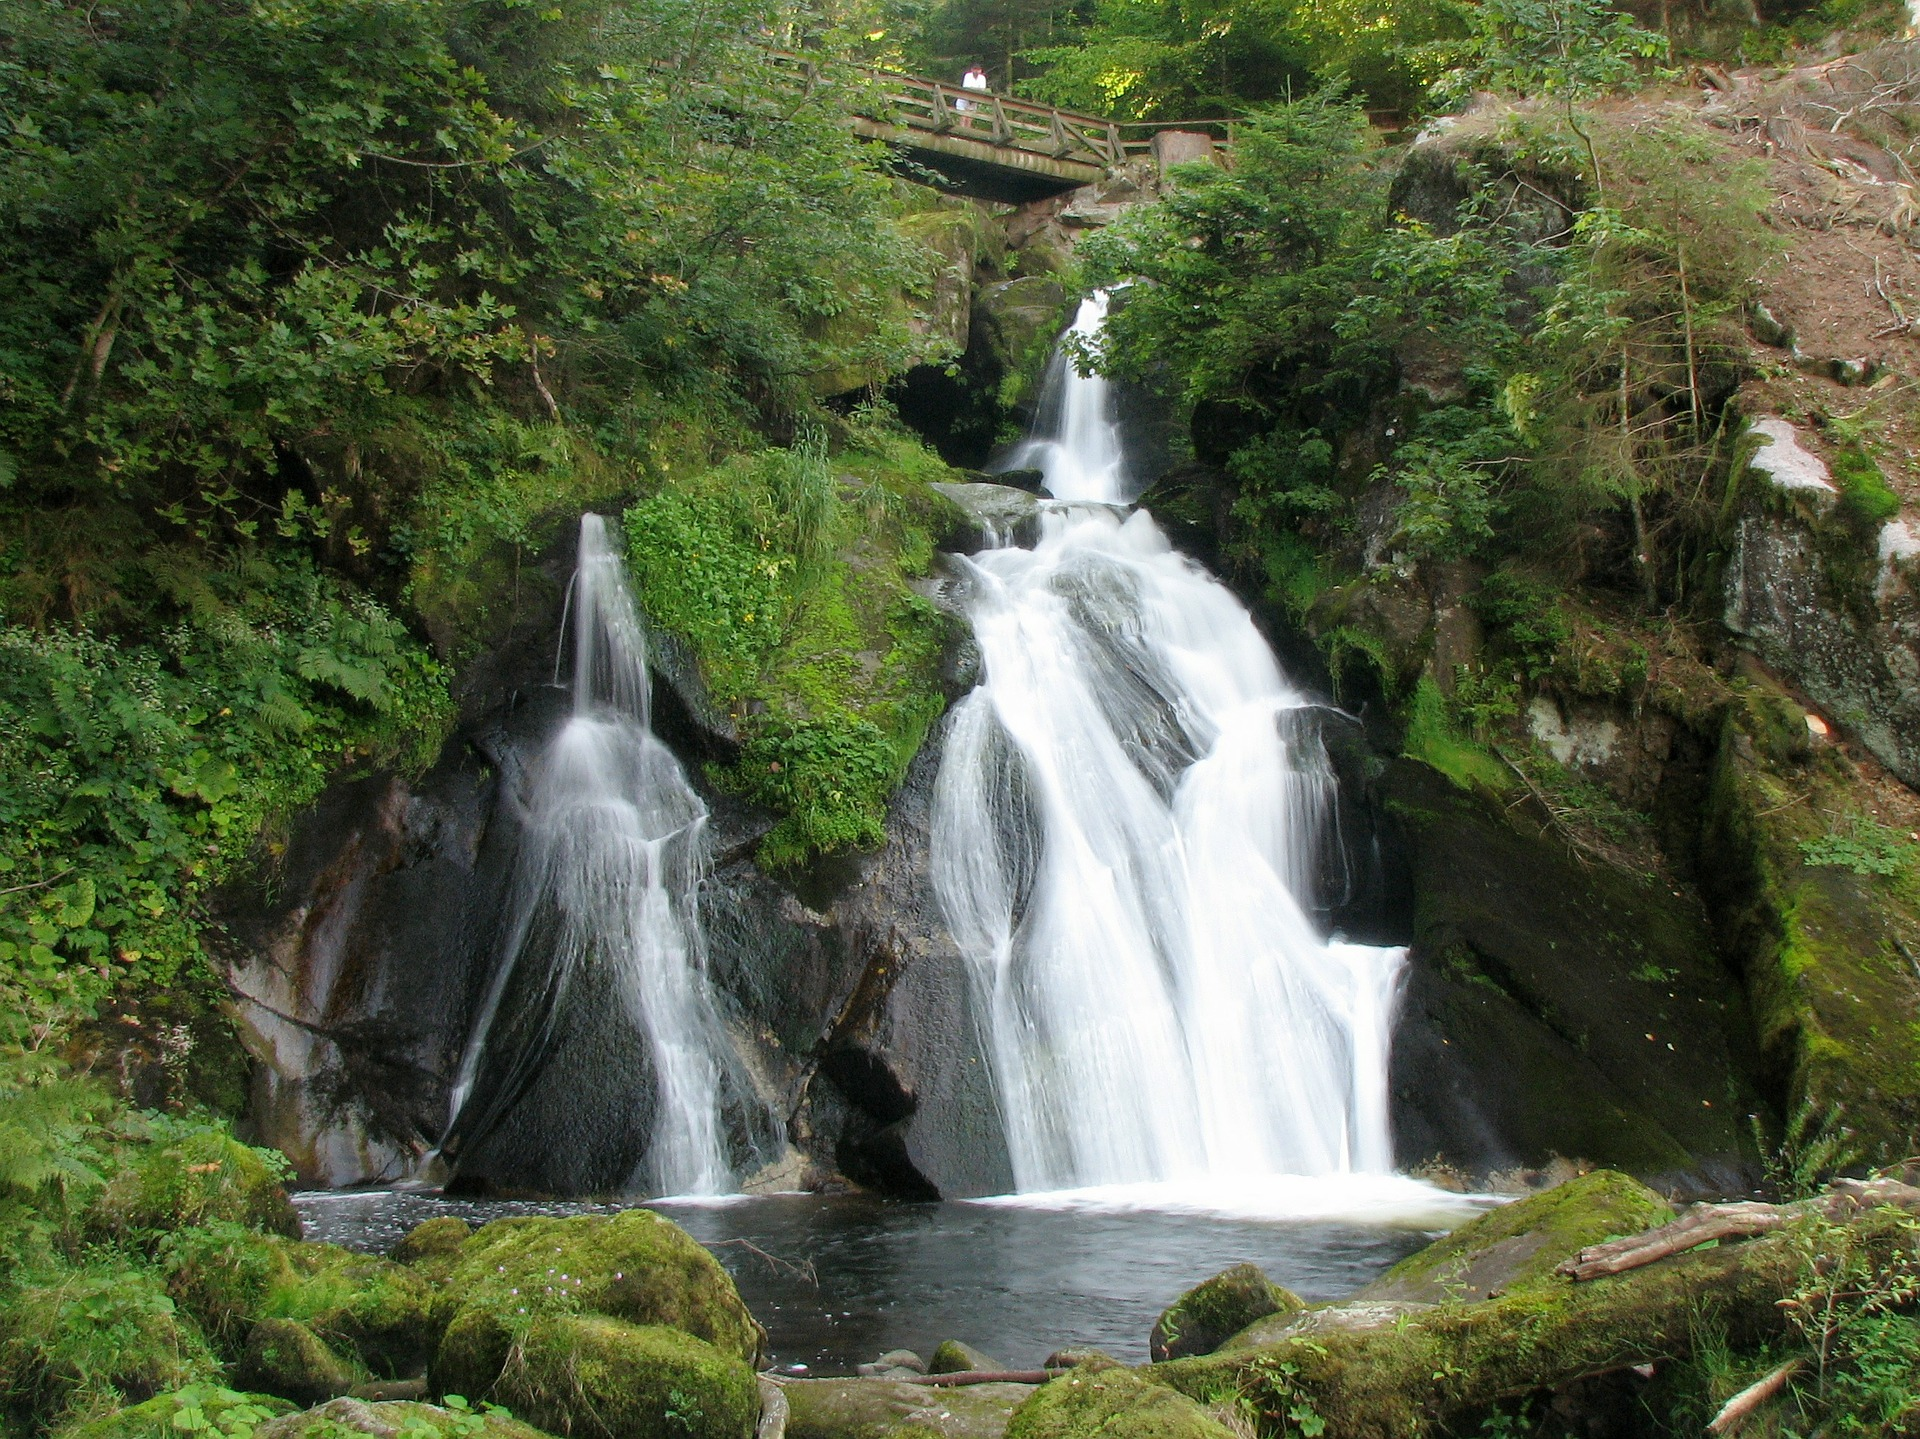 Image of the Triberg Waterfall